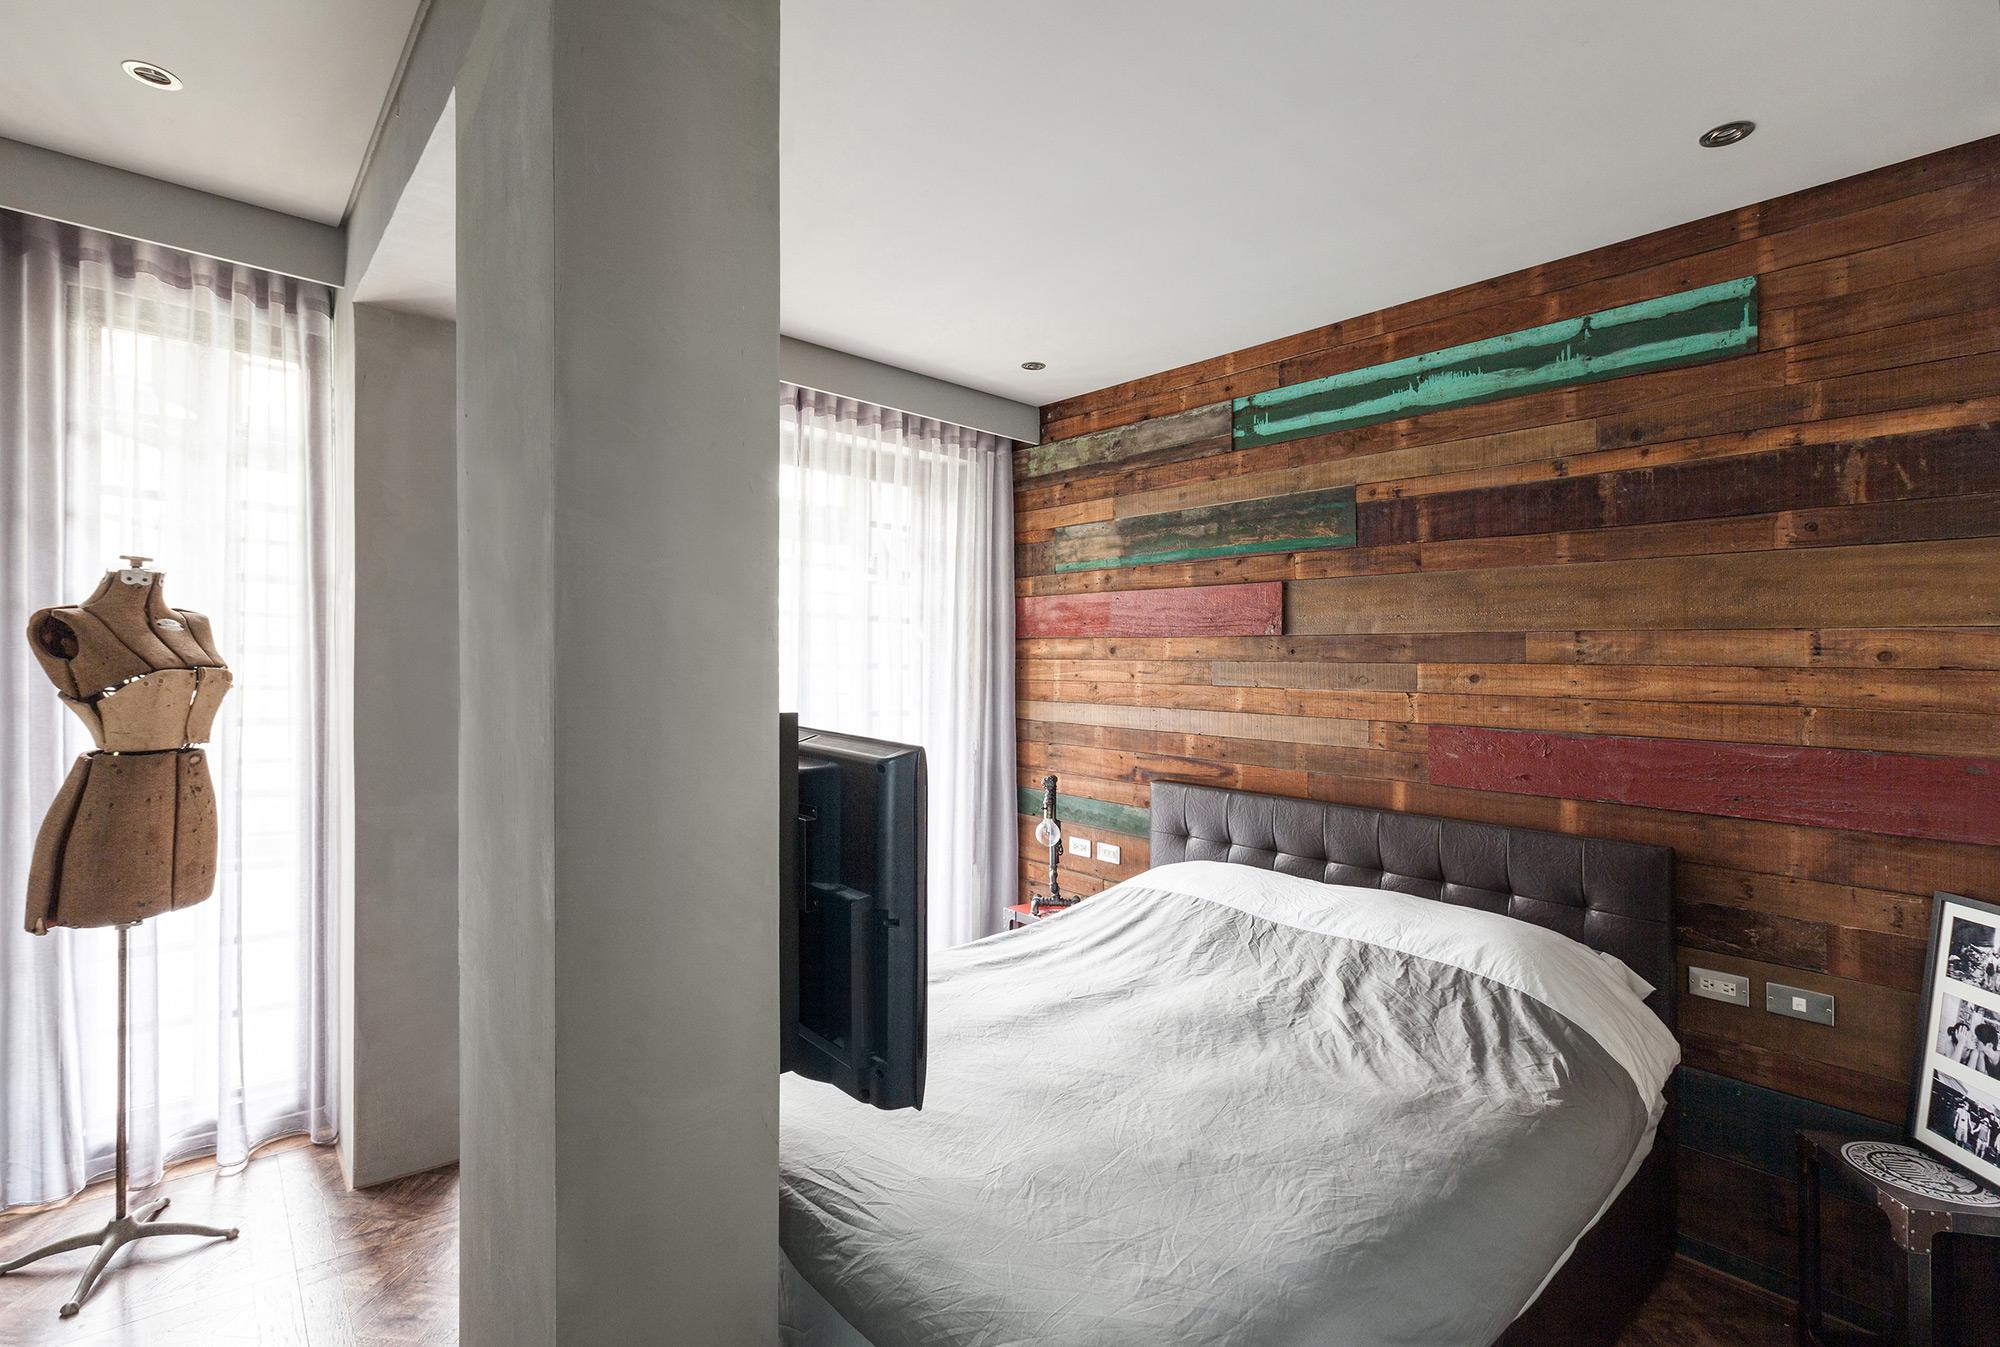 Apartment Refurbishment / CHI-TORCH Interior Design (9)